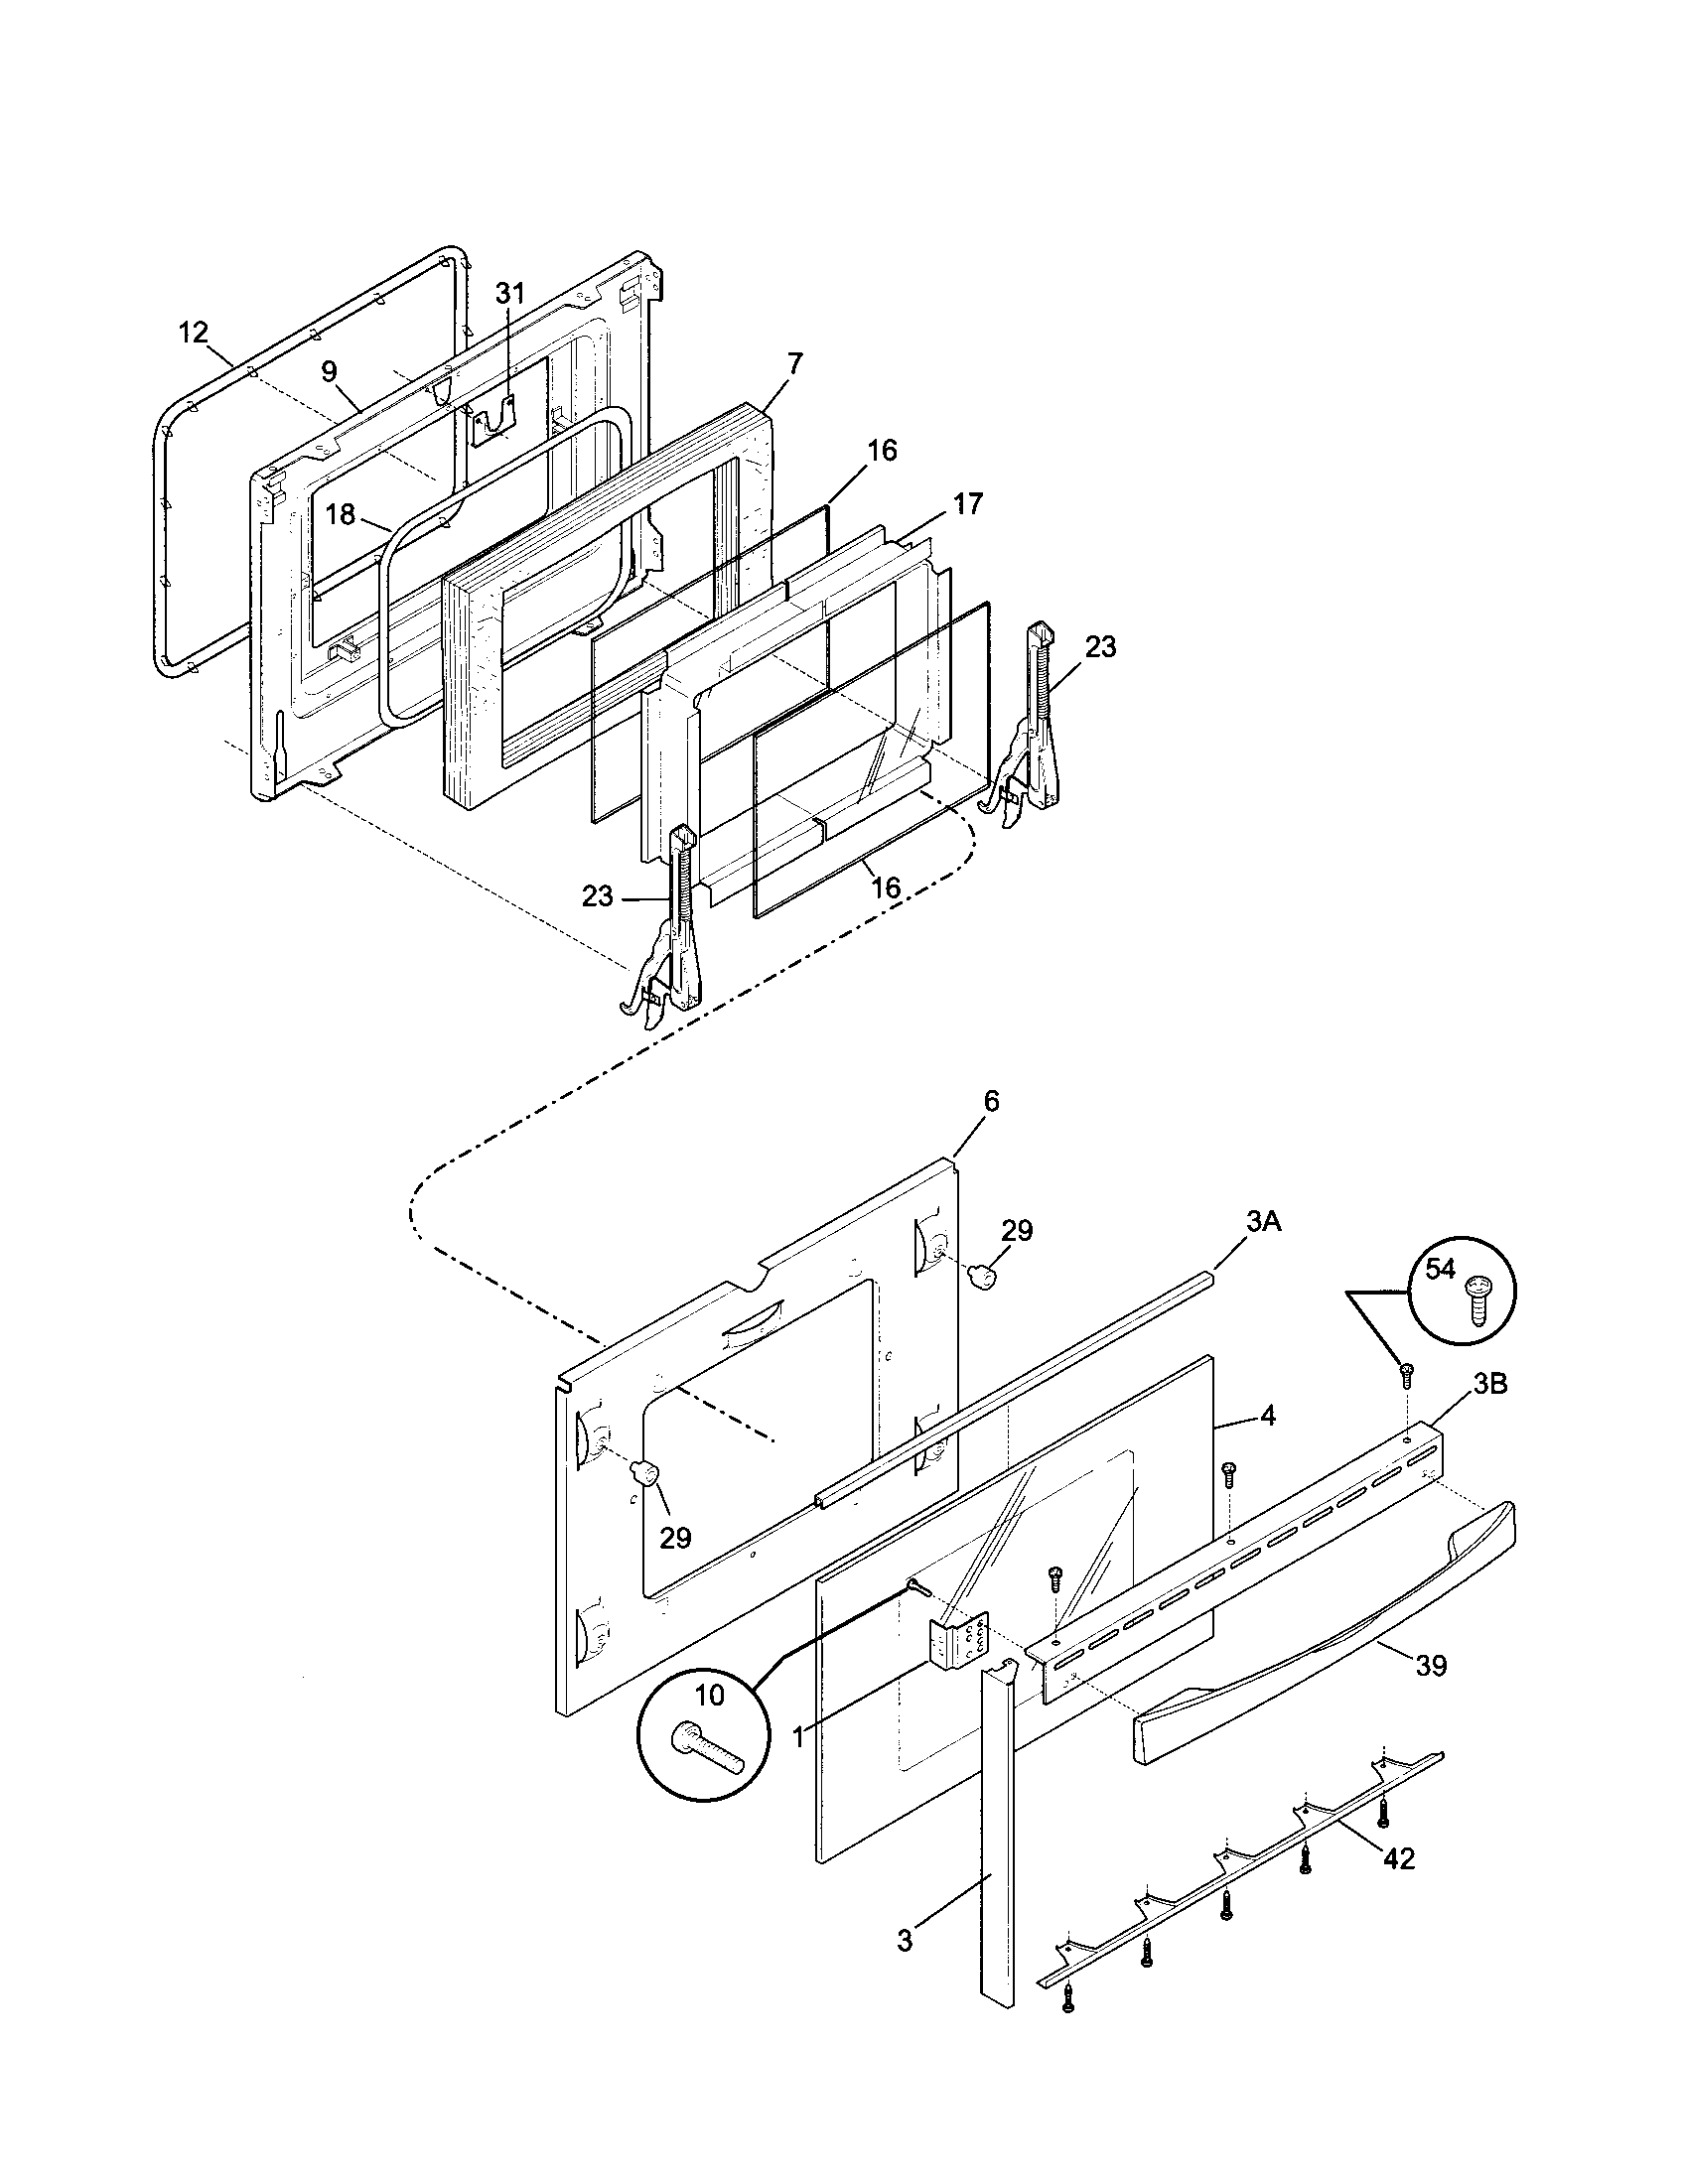 kenmore dishwasher door panel parts diagram auto electrical wiringkenmore dishwasher door panel parts diagram